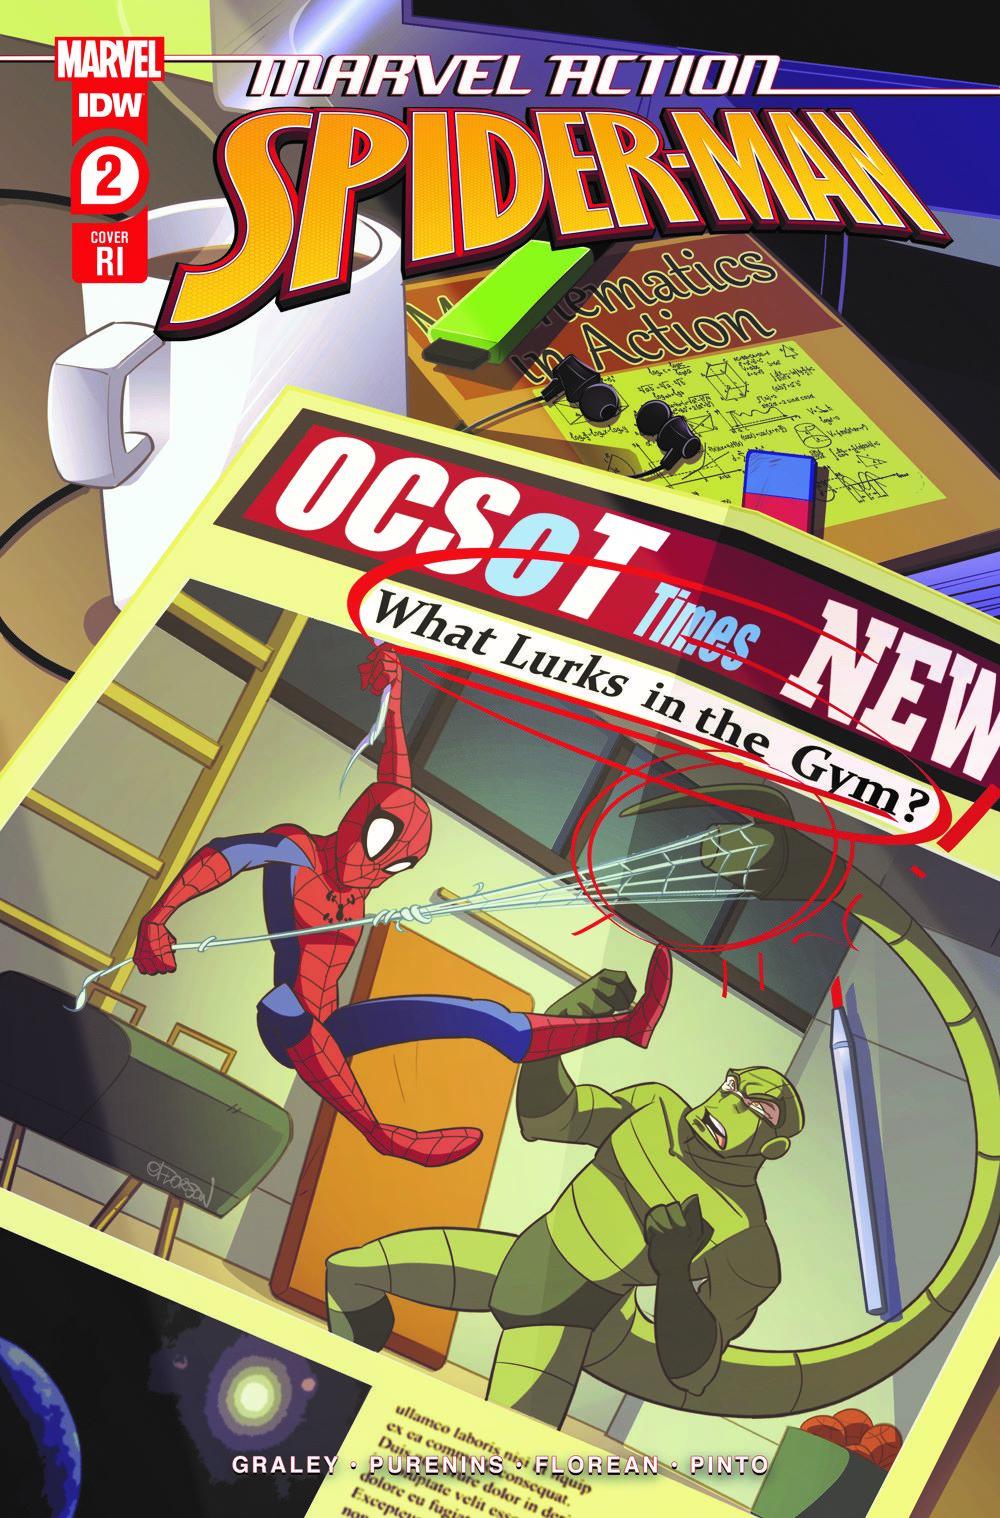 SpidermanV3-02_cvrRI ComicList Previews: MARVEL ACTION SPIDER-MAN VOLUME 3 #2